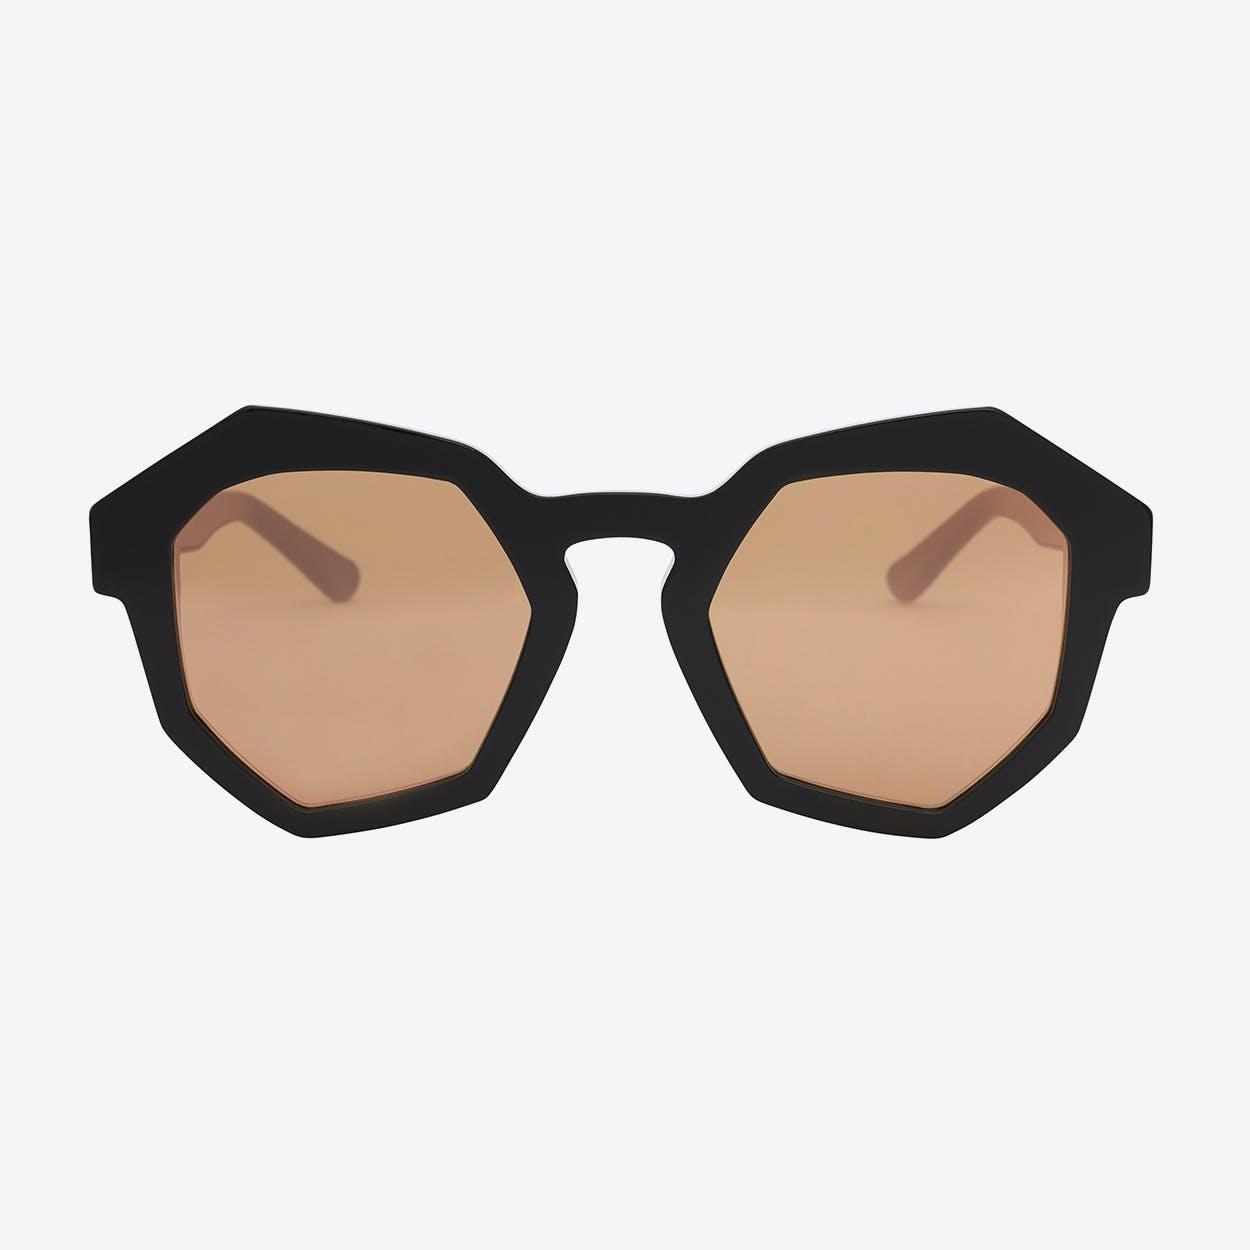 Hoxton Sunglasses in Black